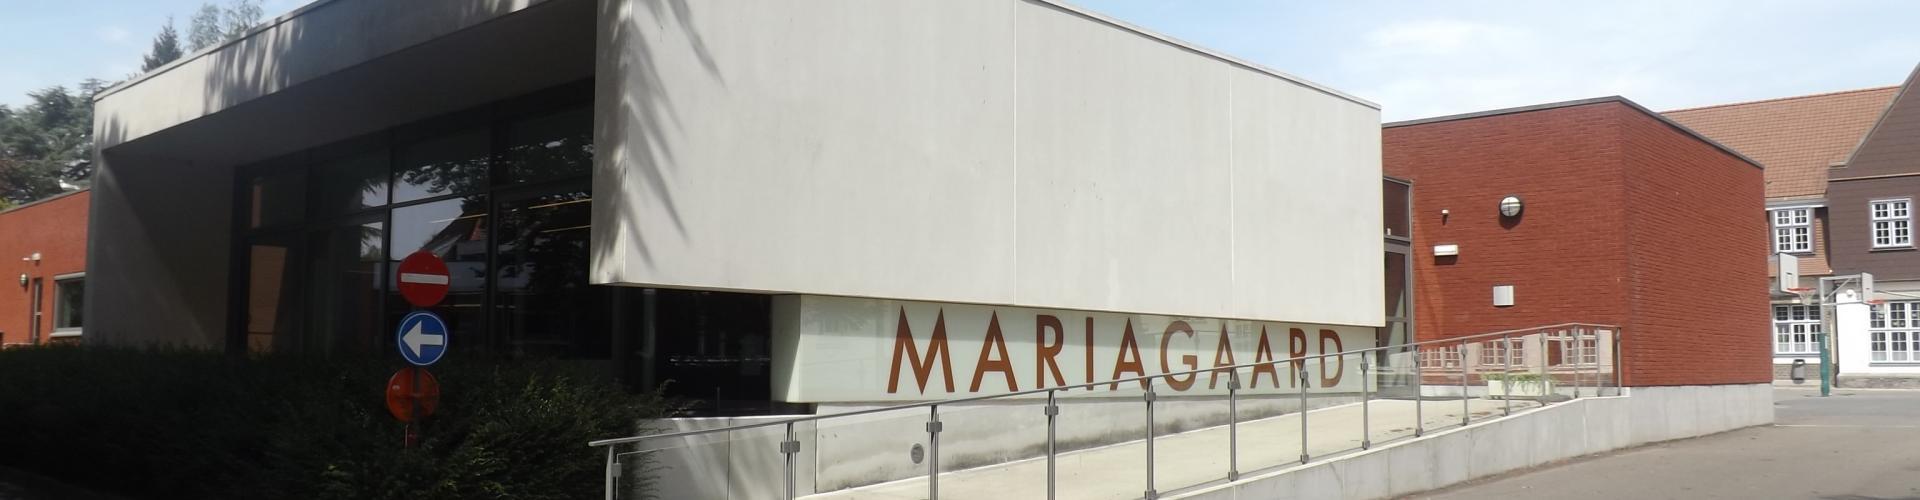 Mariagaard Wetteren